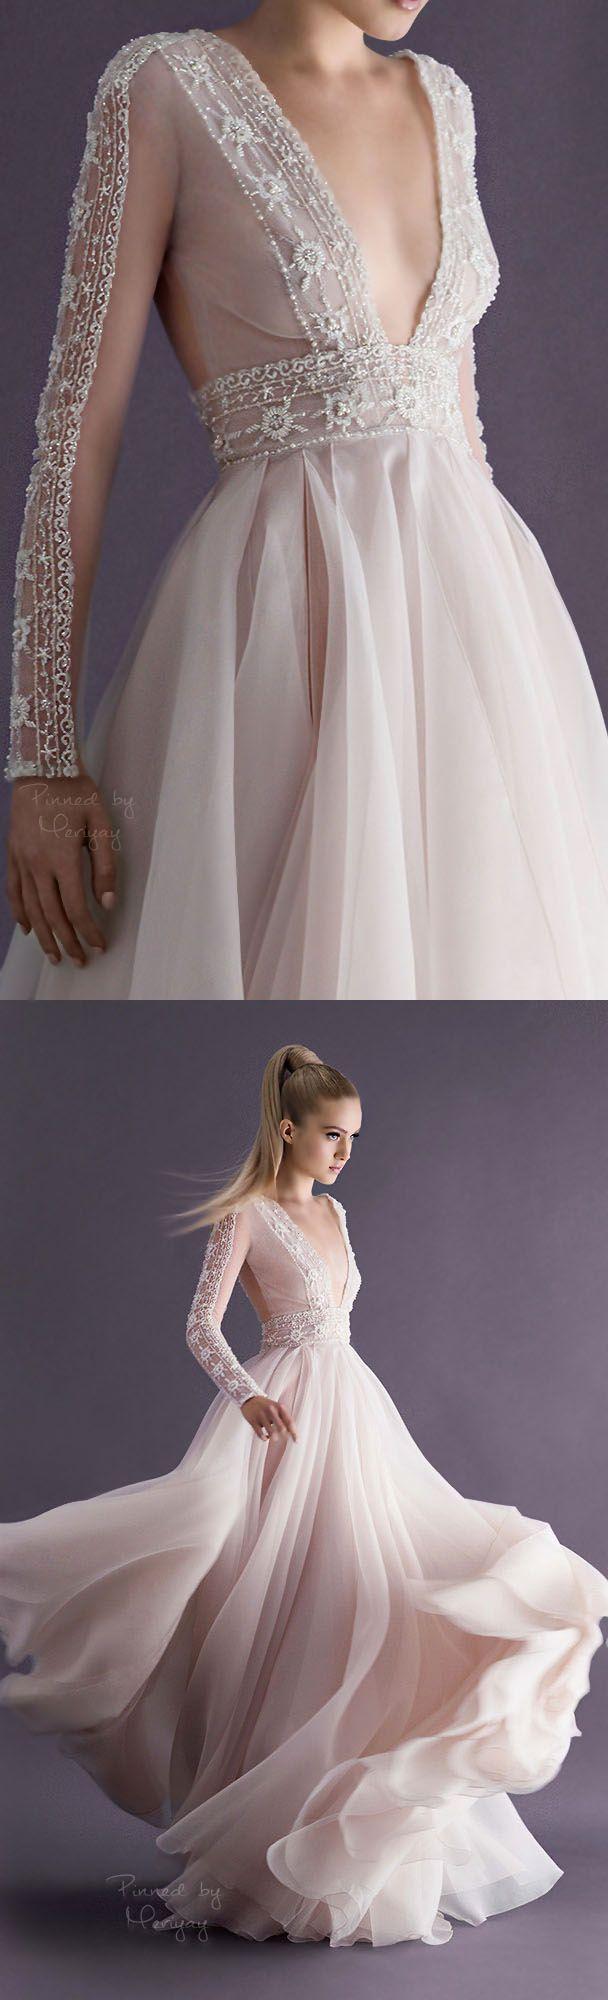 Giuliana rancic 2014 oscars paolo sebastian dress - Paolo Sebastian